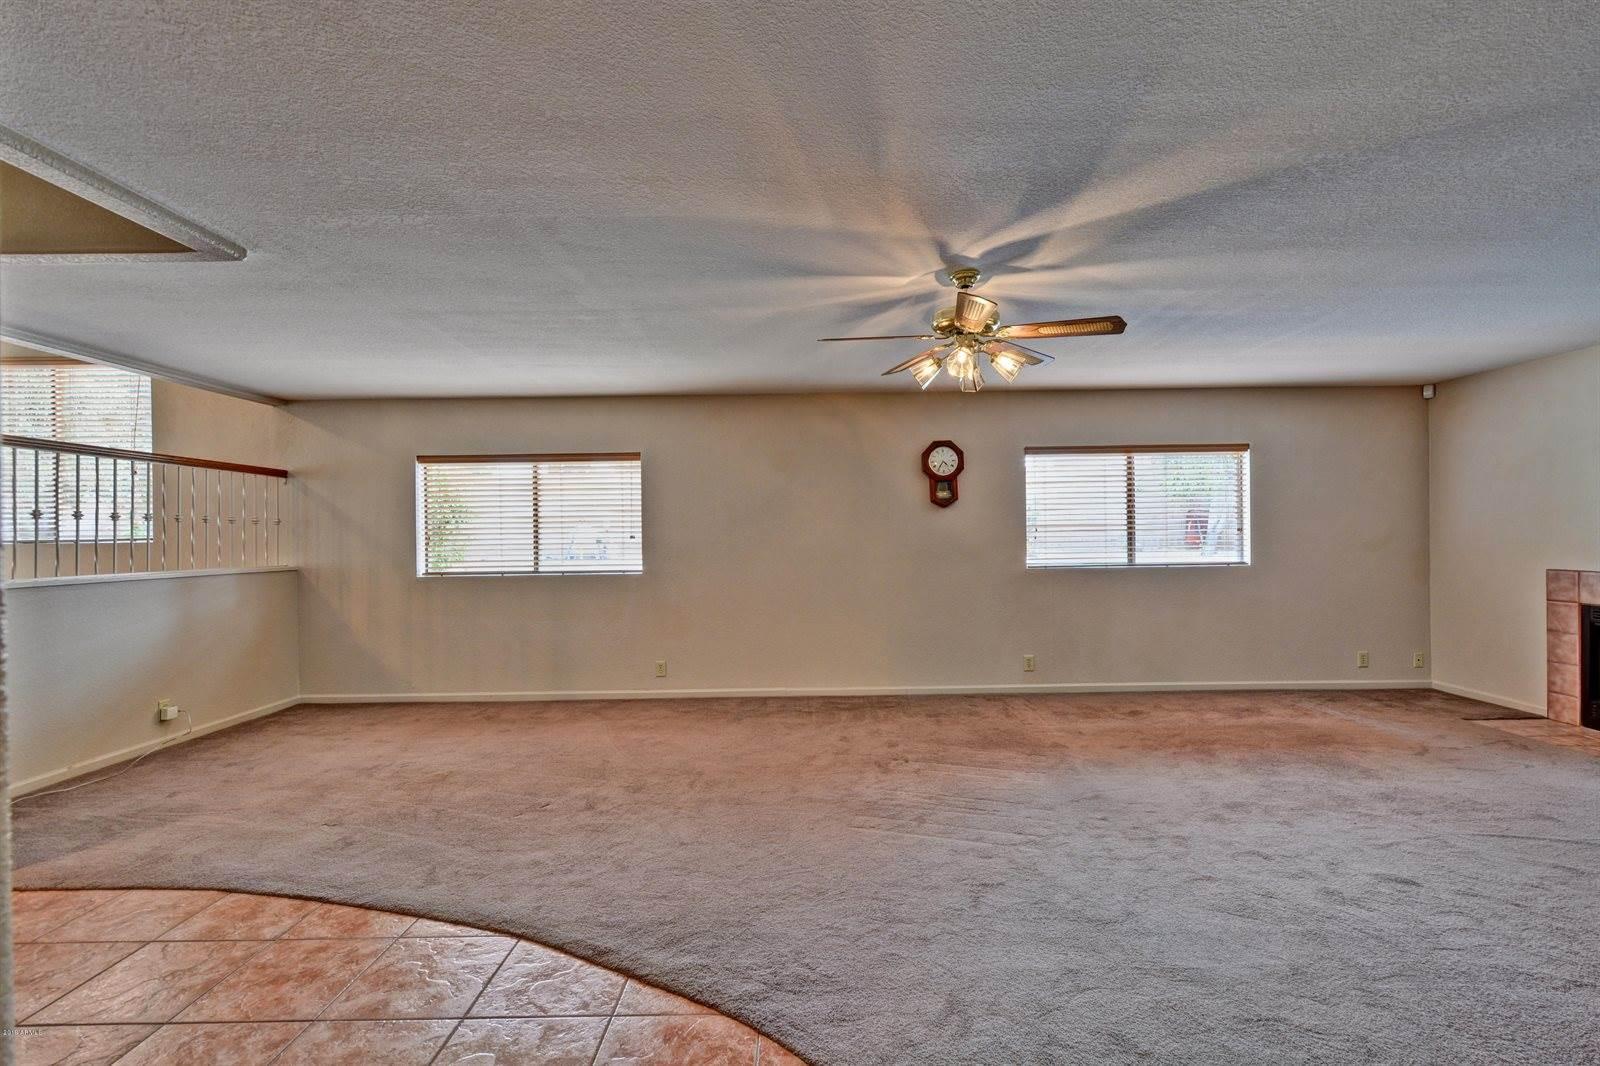 449 East Saratoga Street, Gilbert, AZ 85296